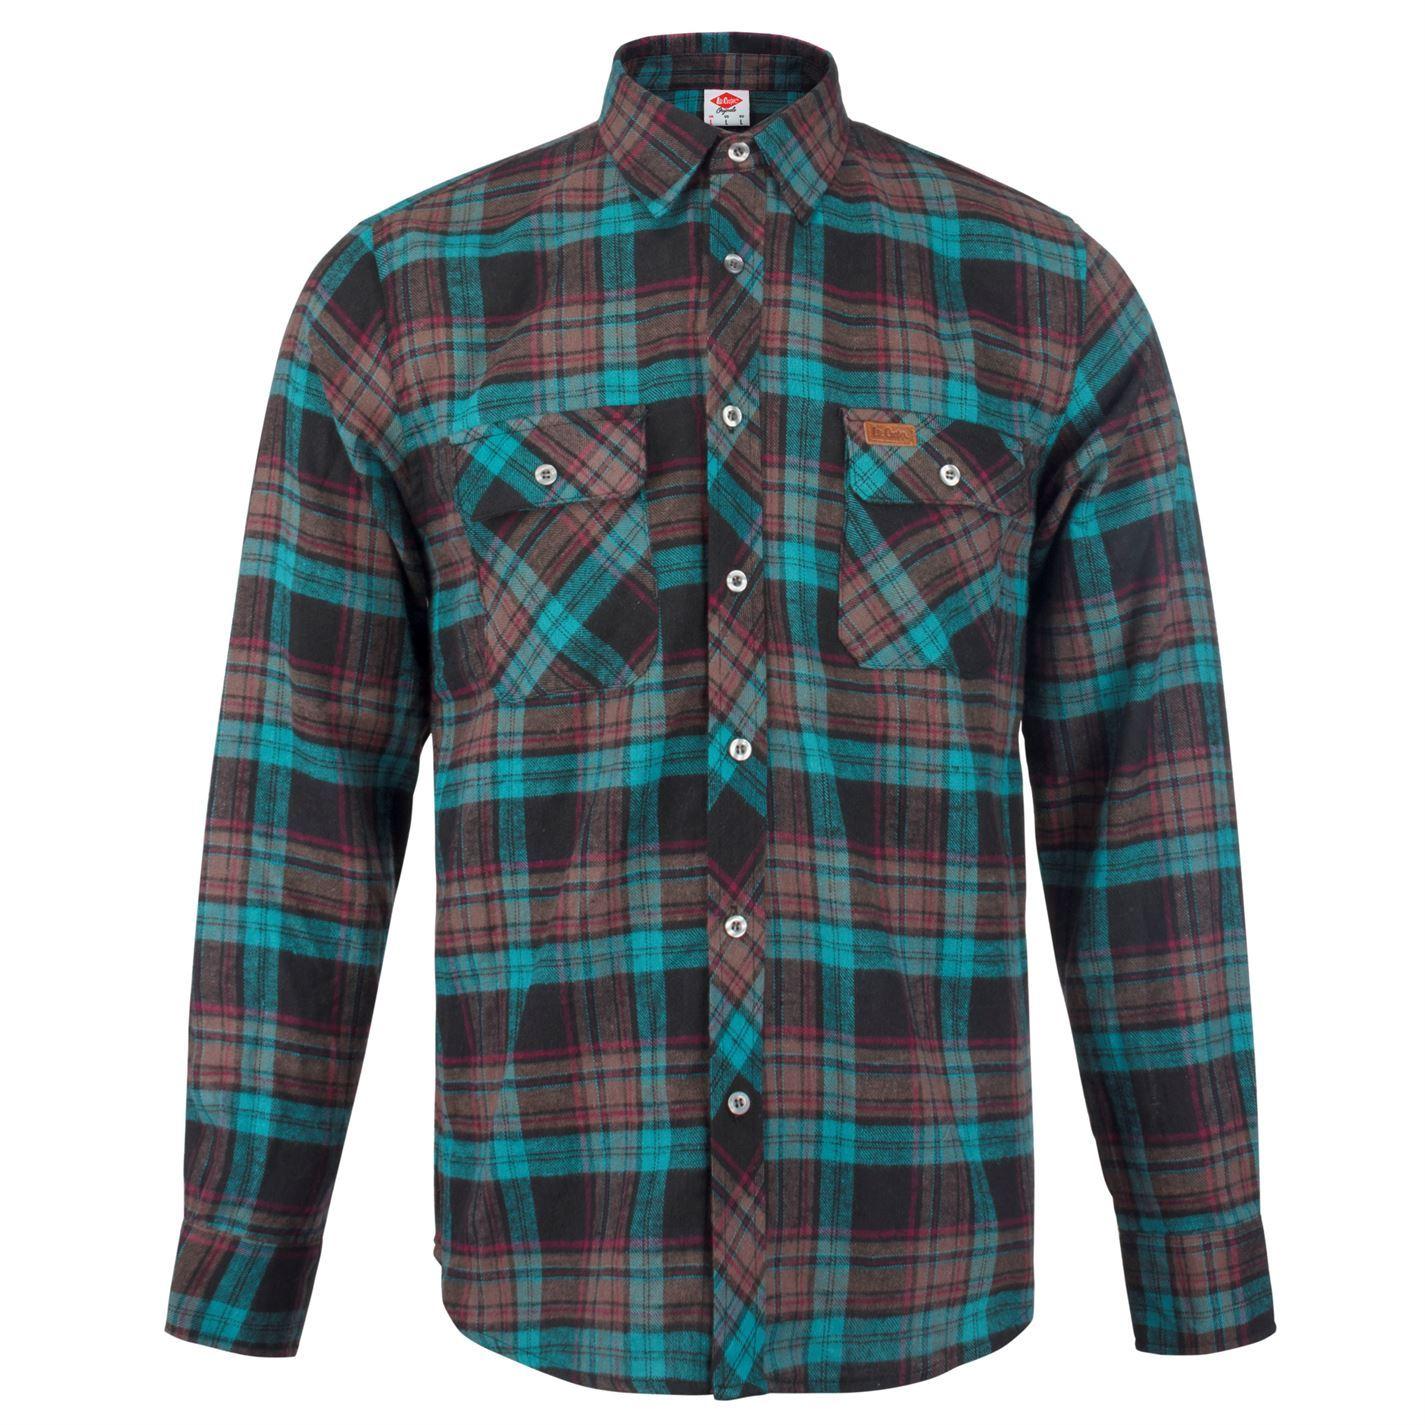 Lee-Cooper-Mens-Slim-Fit-Check-Shirt-Long-Sleeve-Casual